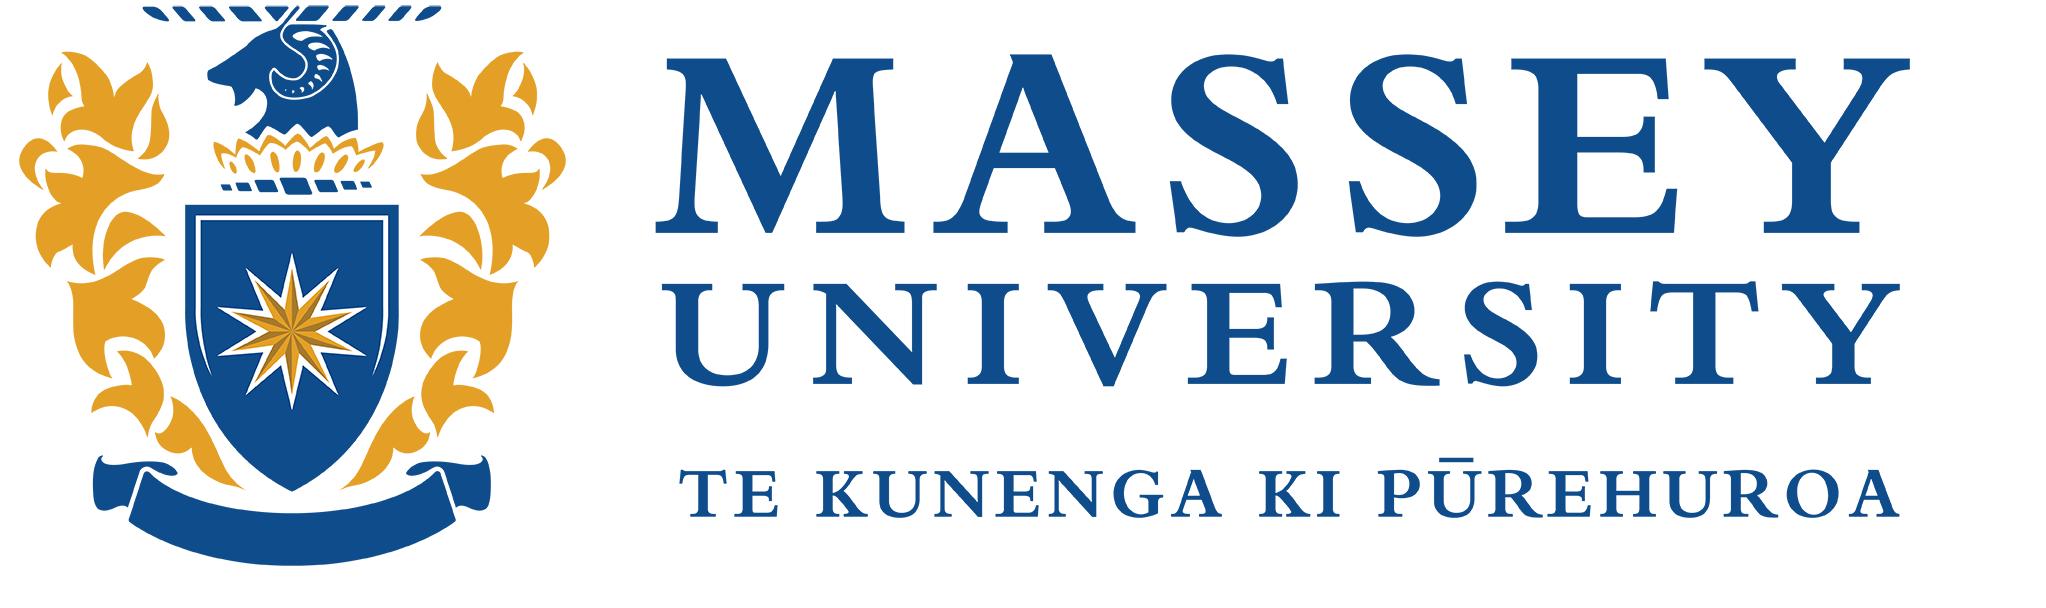 transparent massey university logo jpg - Google Search